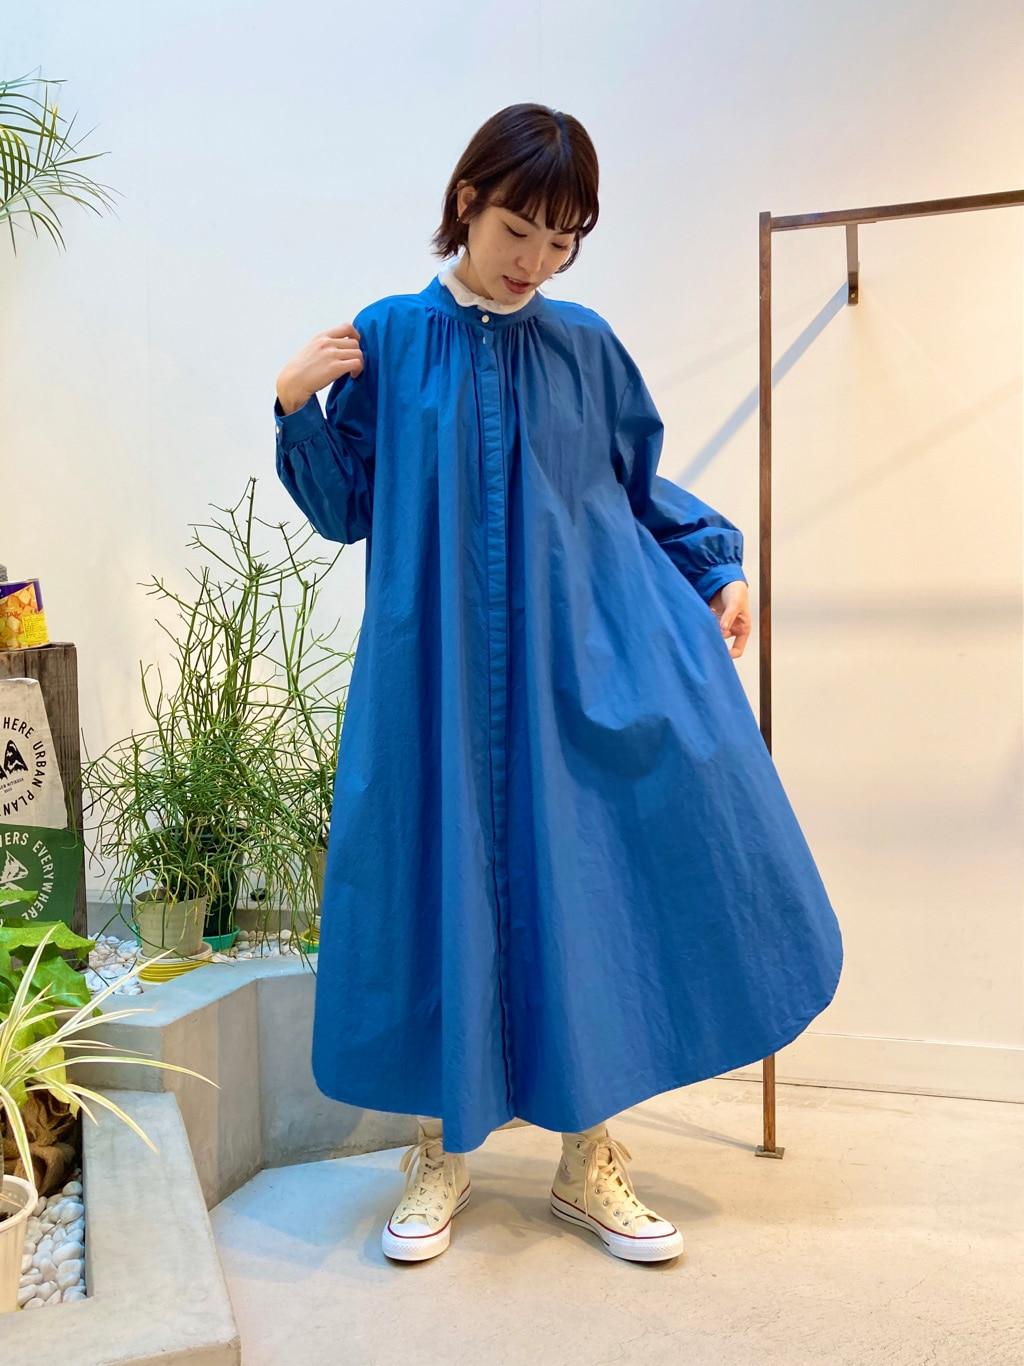 l'atelier du savon 名古屋栄路面 身長:161cm 2020.11.20